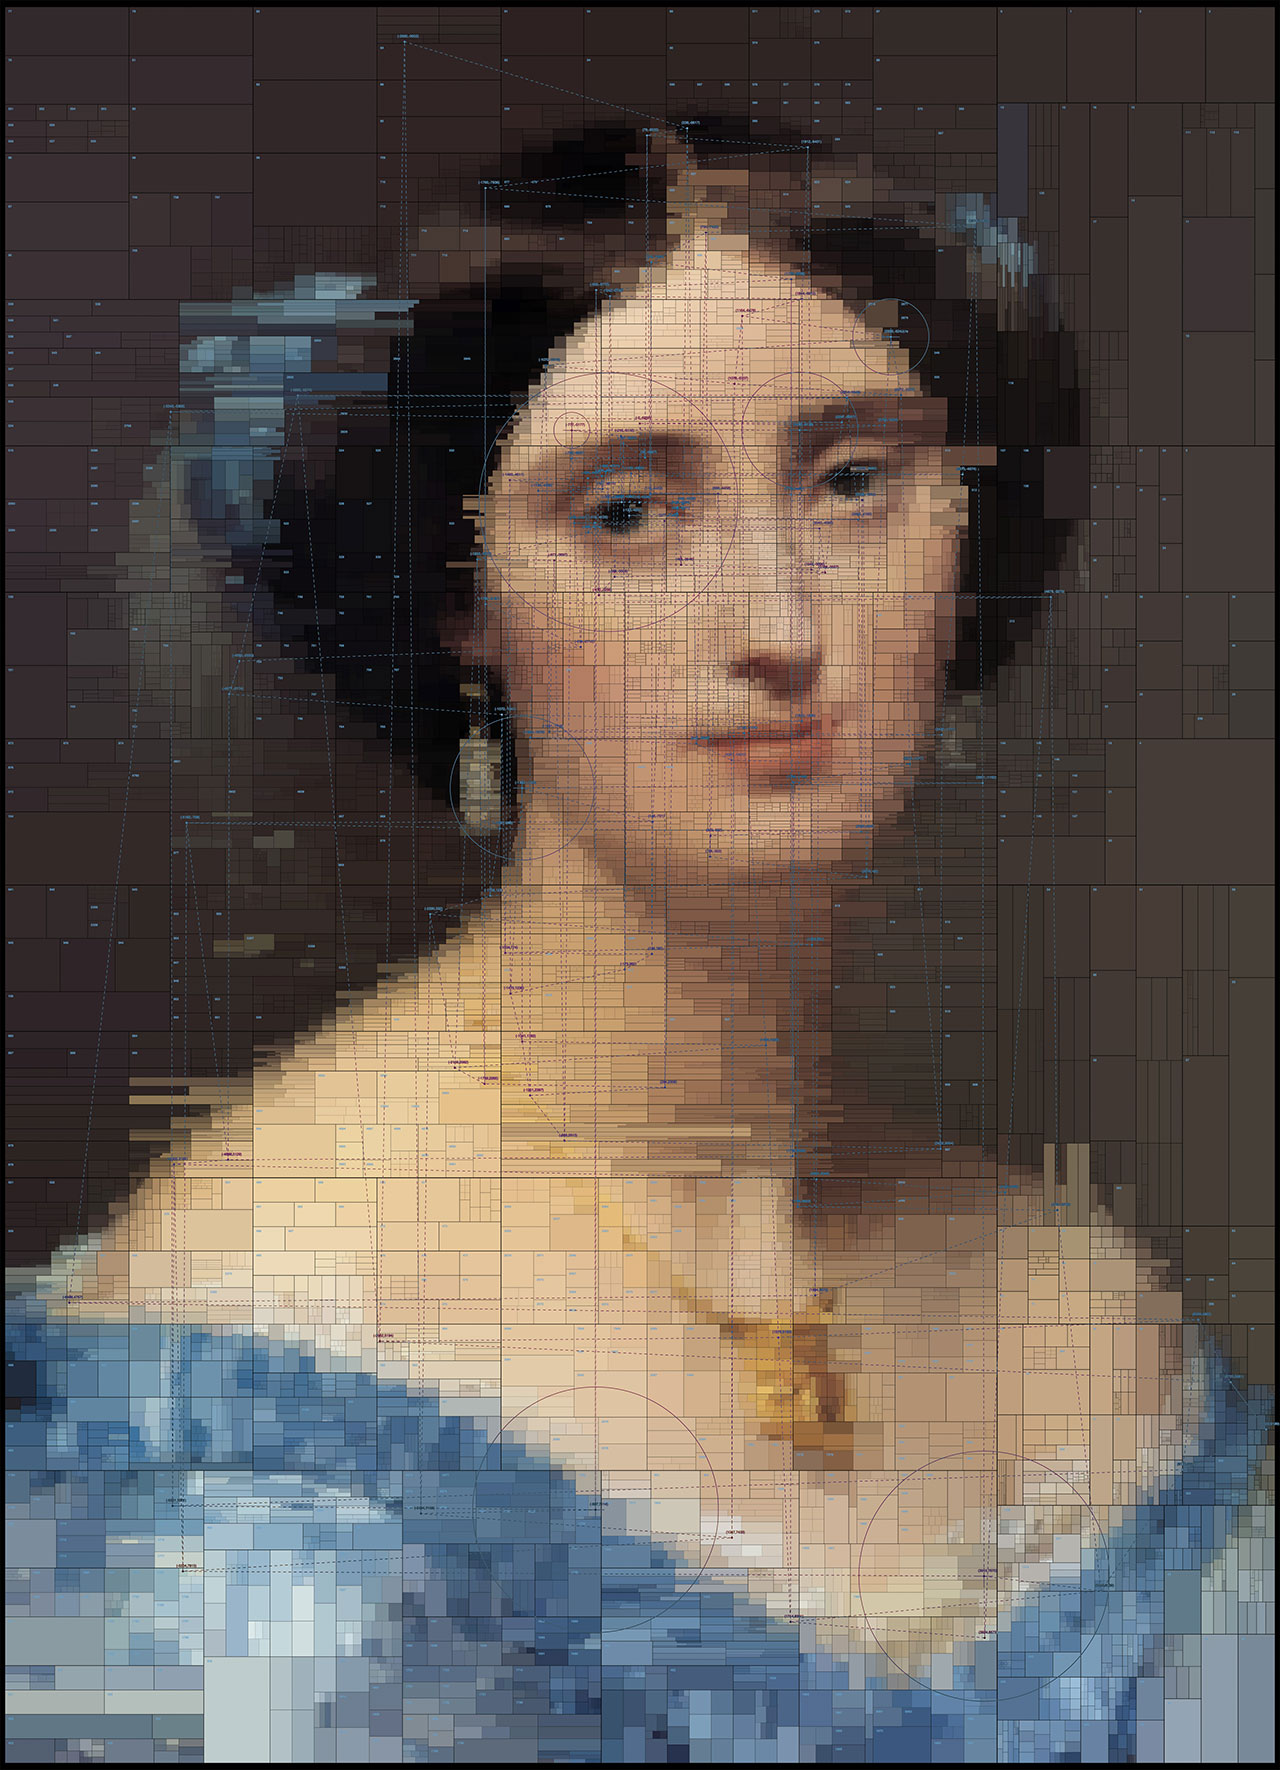 Albert, from Portraits series by Dimitris Ladopoulos (Original painting -The Princesse de BrogliebyJean-Auguste-Dominique Ingres,1851–53).